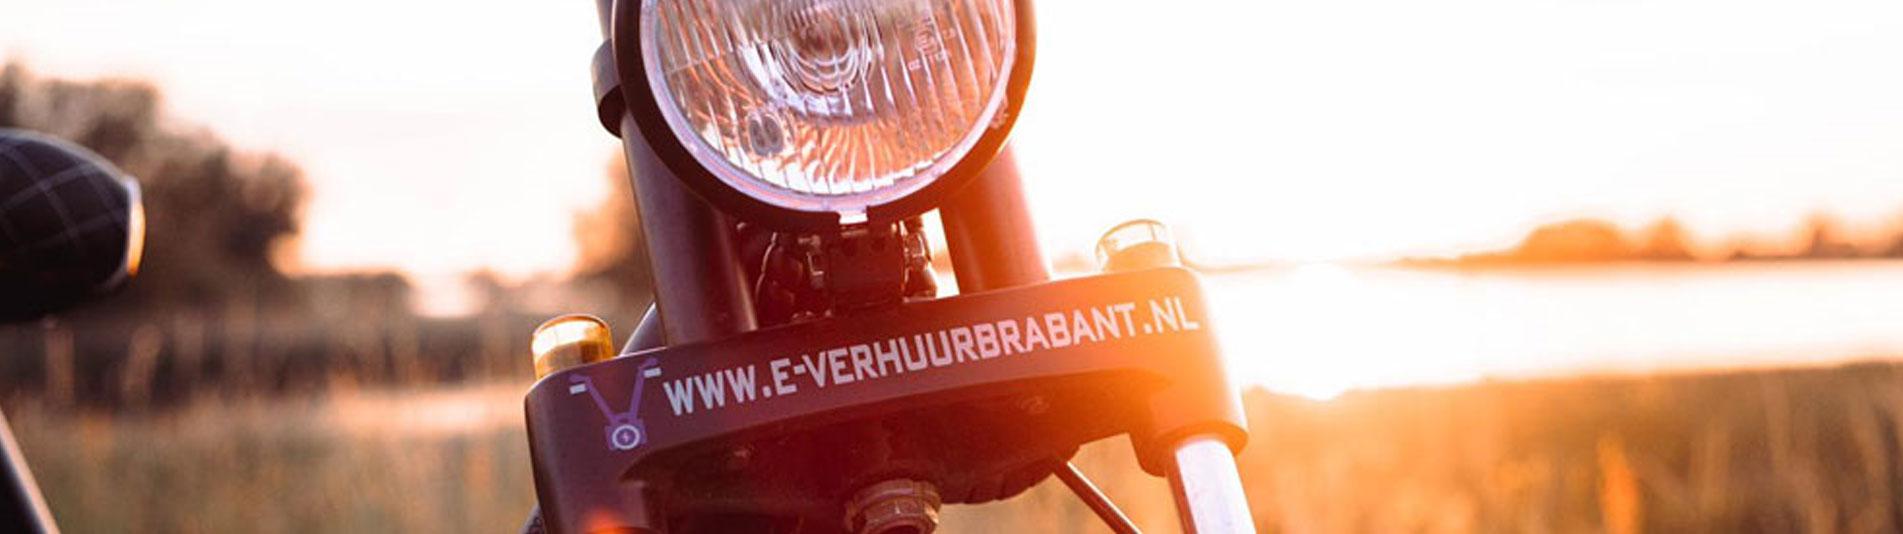 E-Verhuur Brabant banner